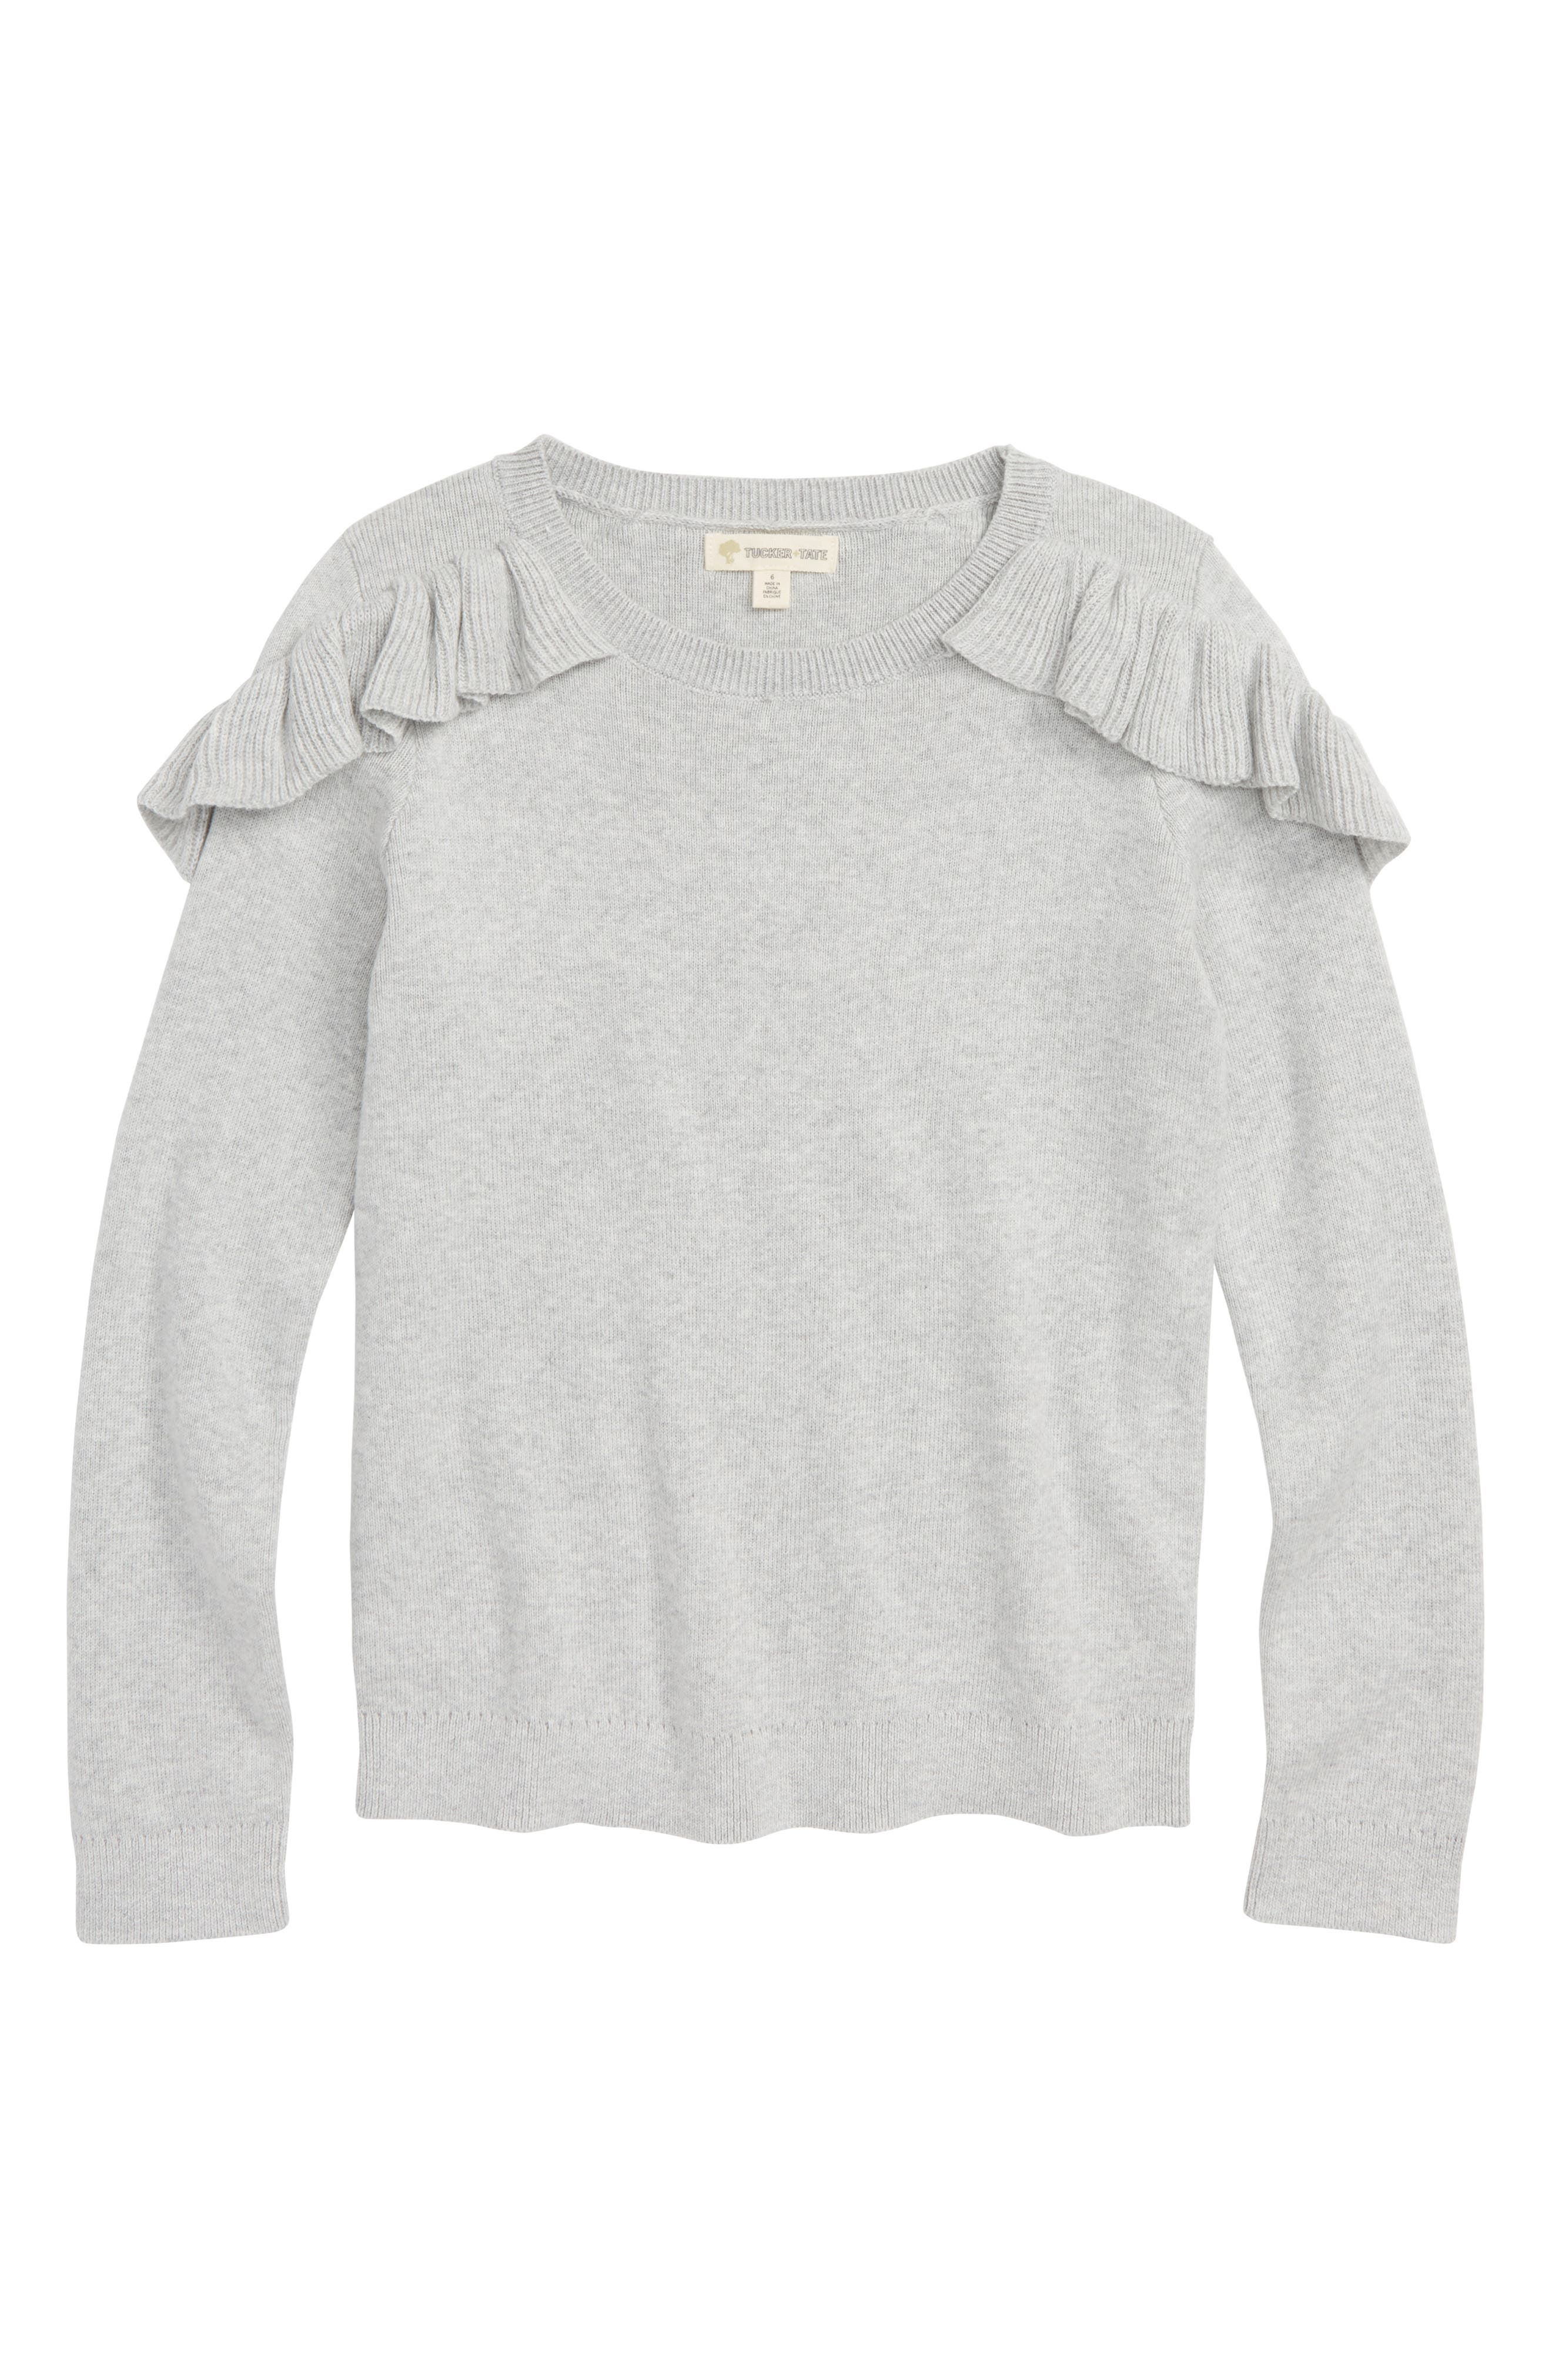 Ruffle Sweater,                         Main,                         color, GREY ASH HEATHER